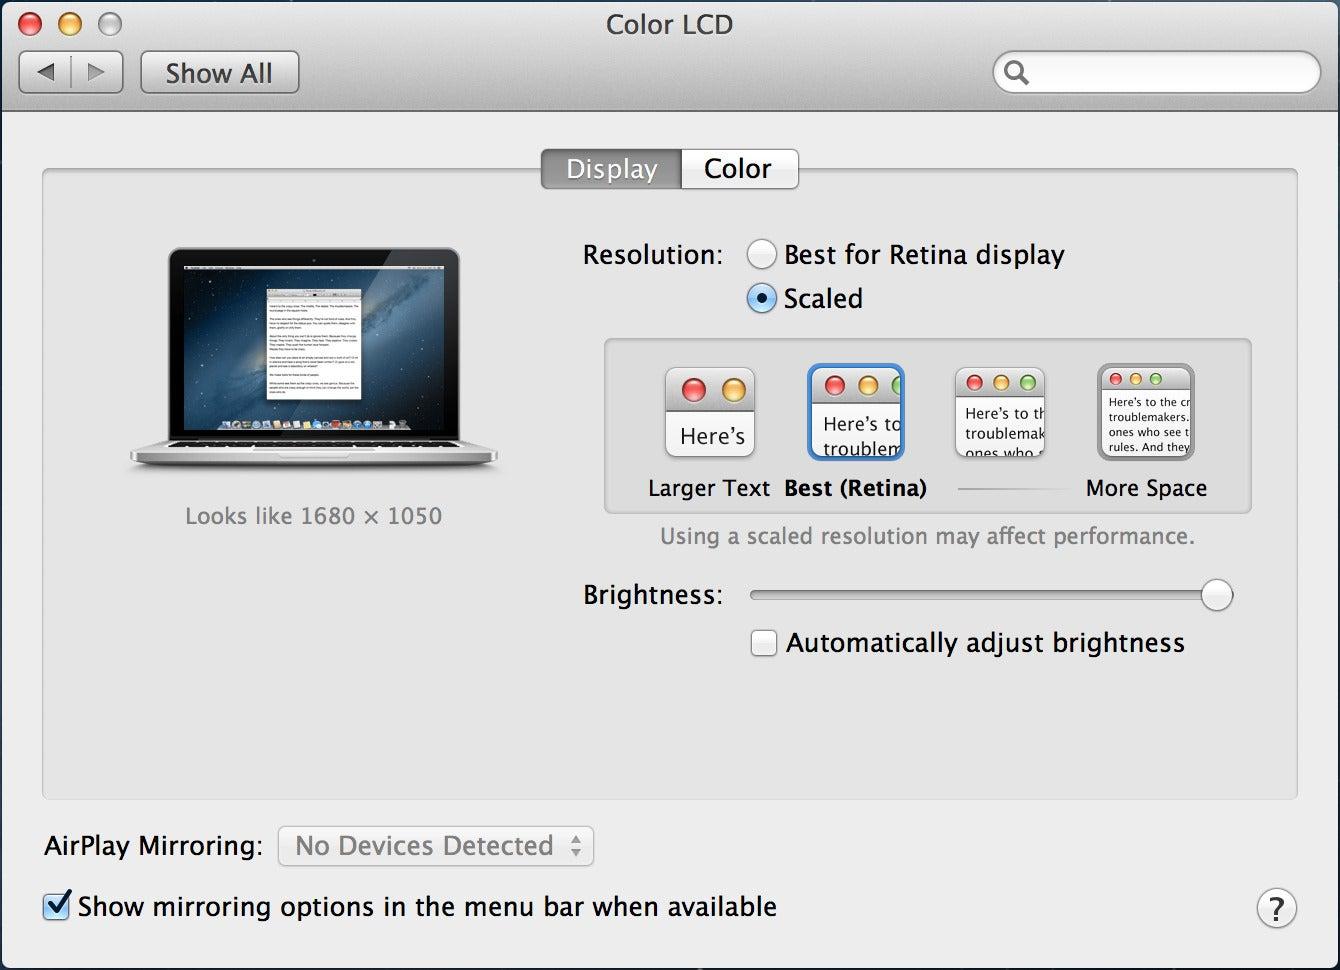 Image Gallery: Macbook pro 13 dimensions